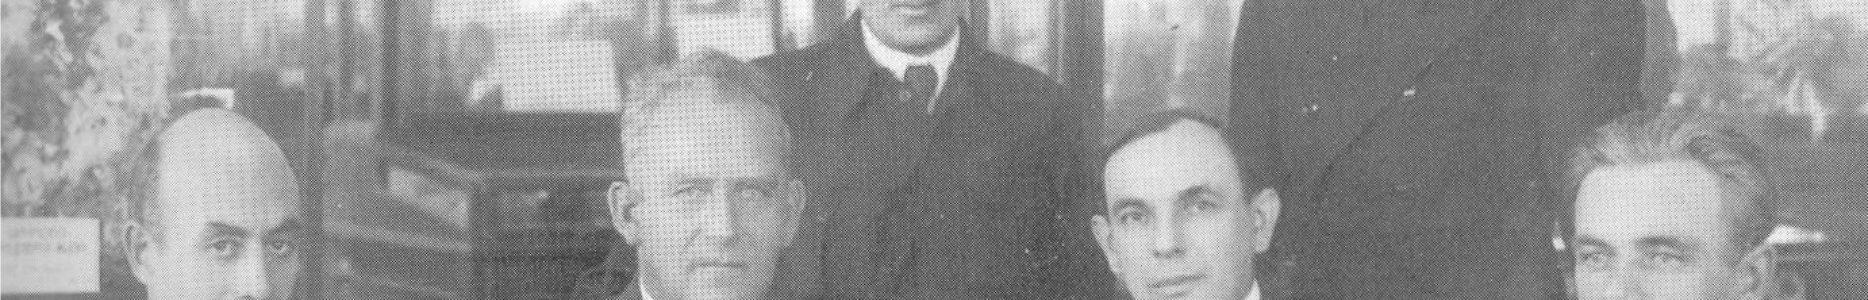 Билибин Юрий Алексеевич